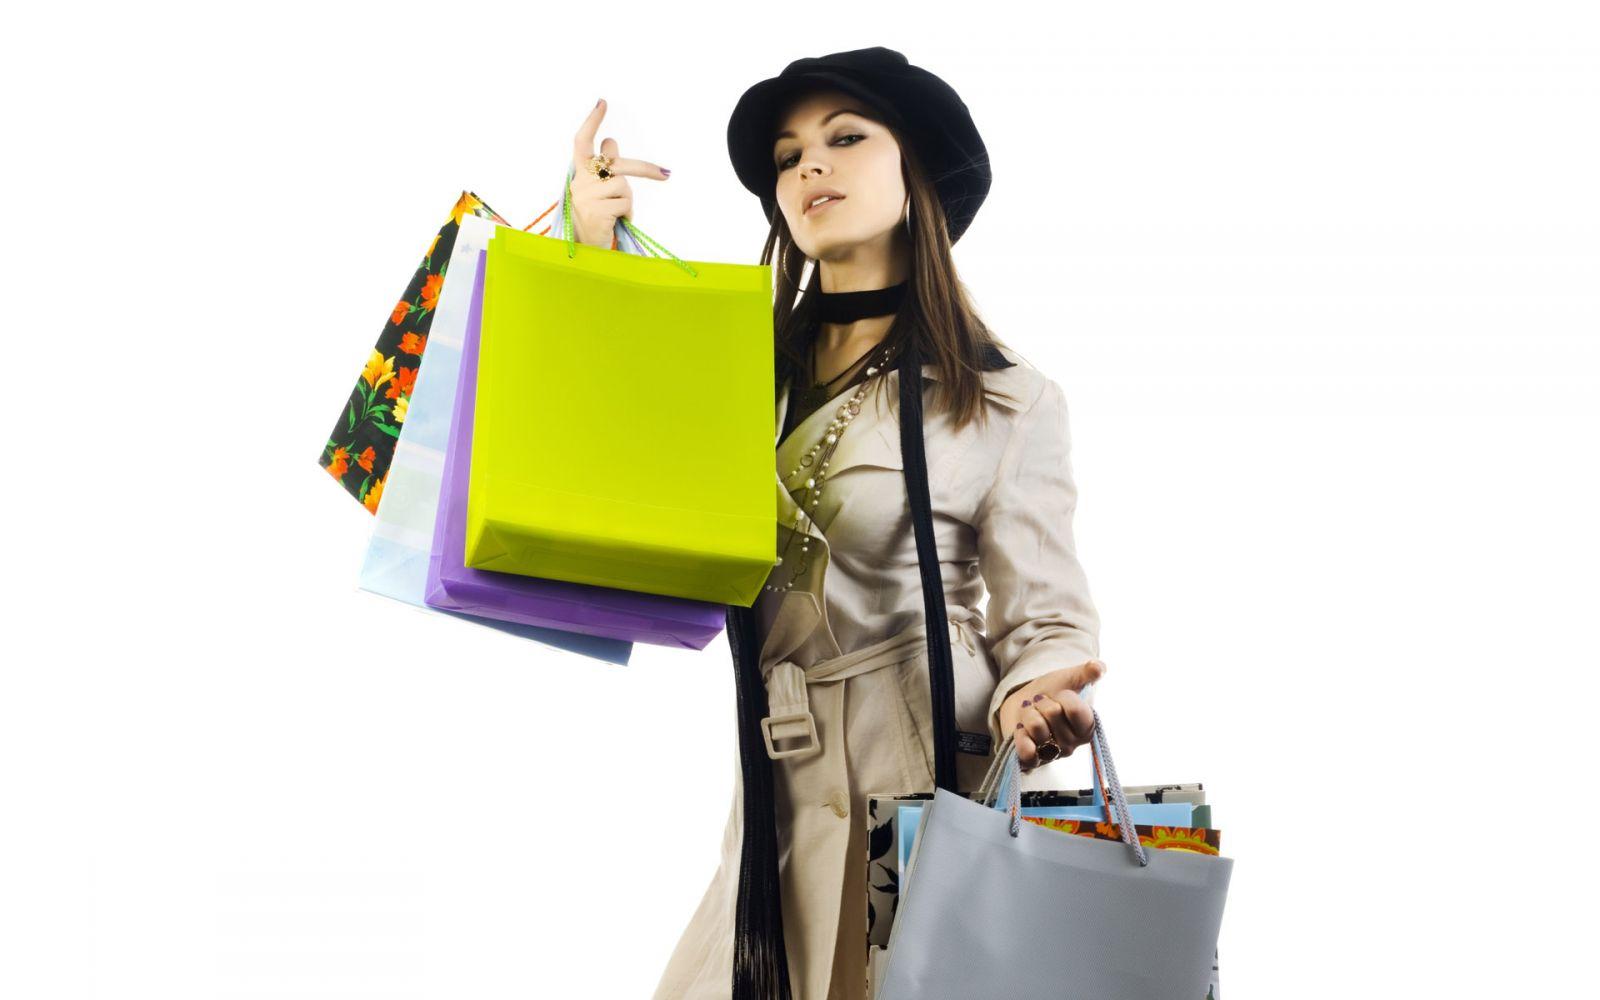 Преимущество промо-кодов при совершении покупок онлайн - фото №2